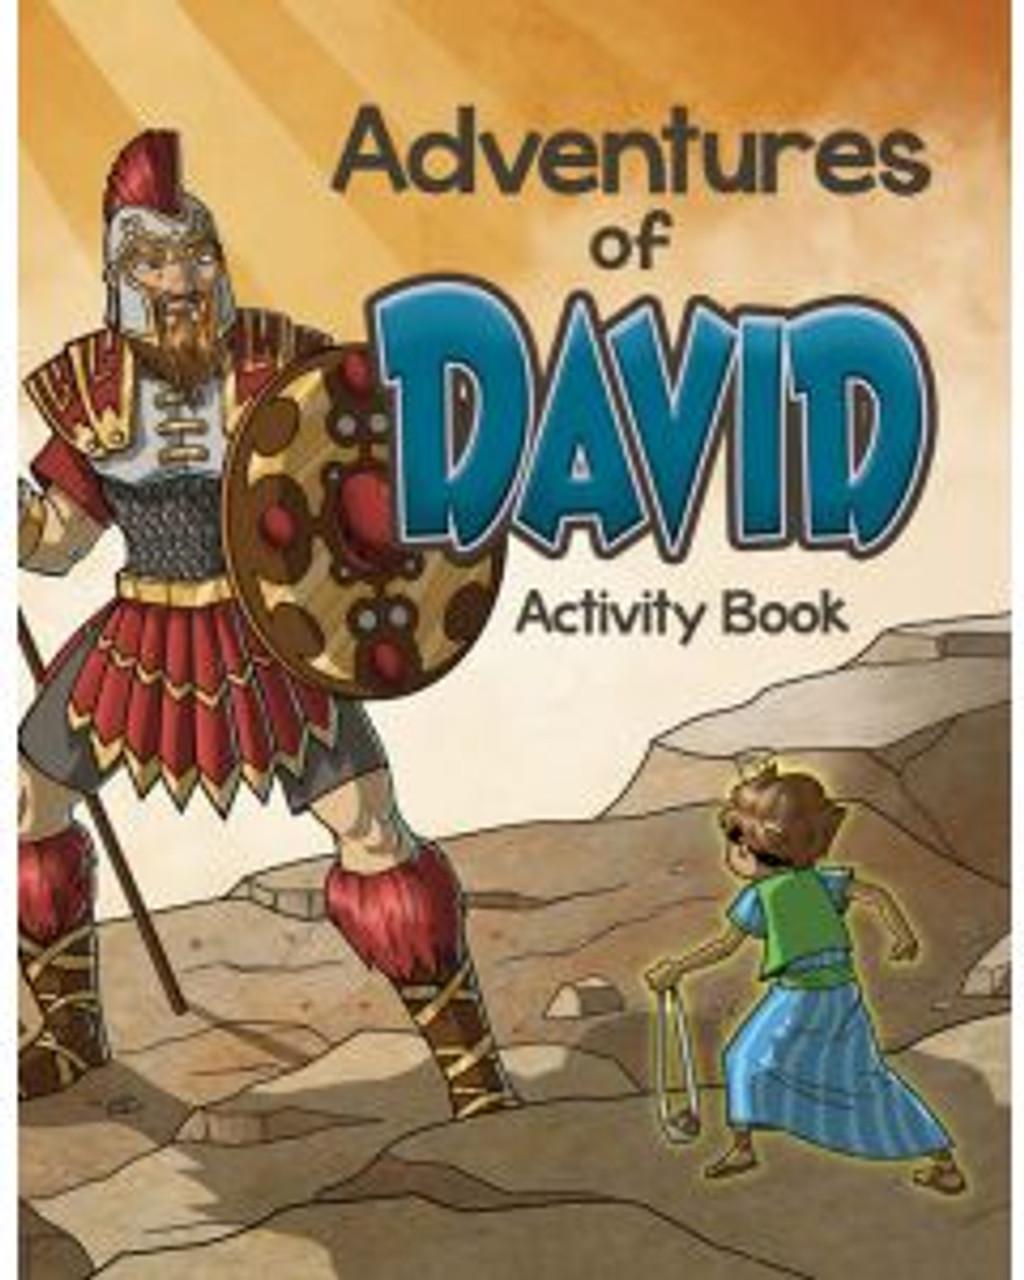 Adventures of David (activity book)